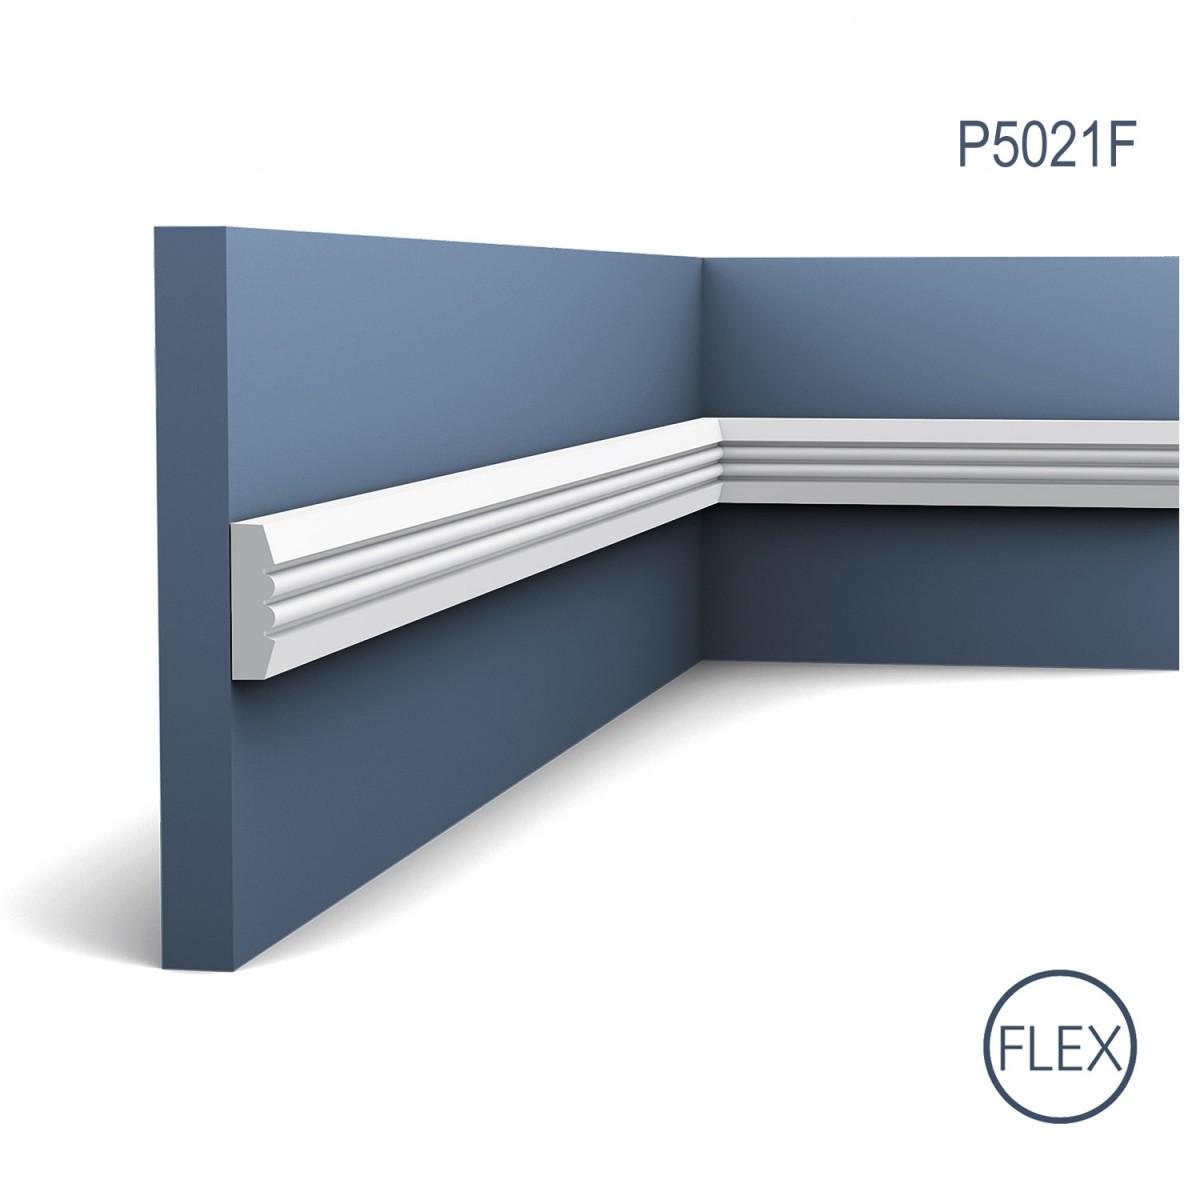 Brau Flex Luxxus P5021F, Dimensiuni: 200 X 3.1 X 0.9 cm, Orac Decor